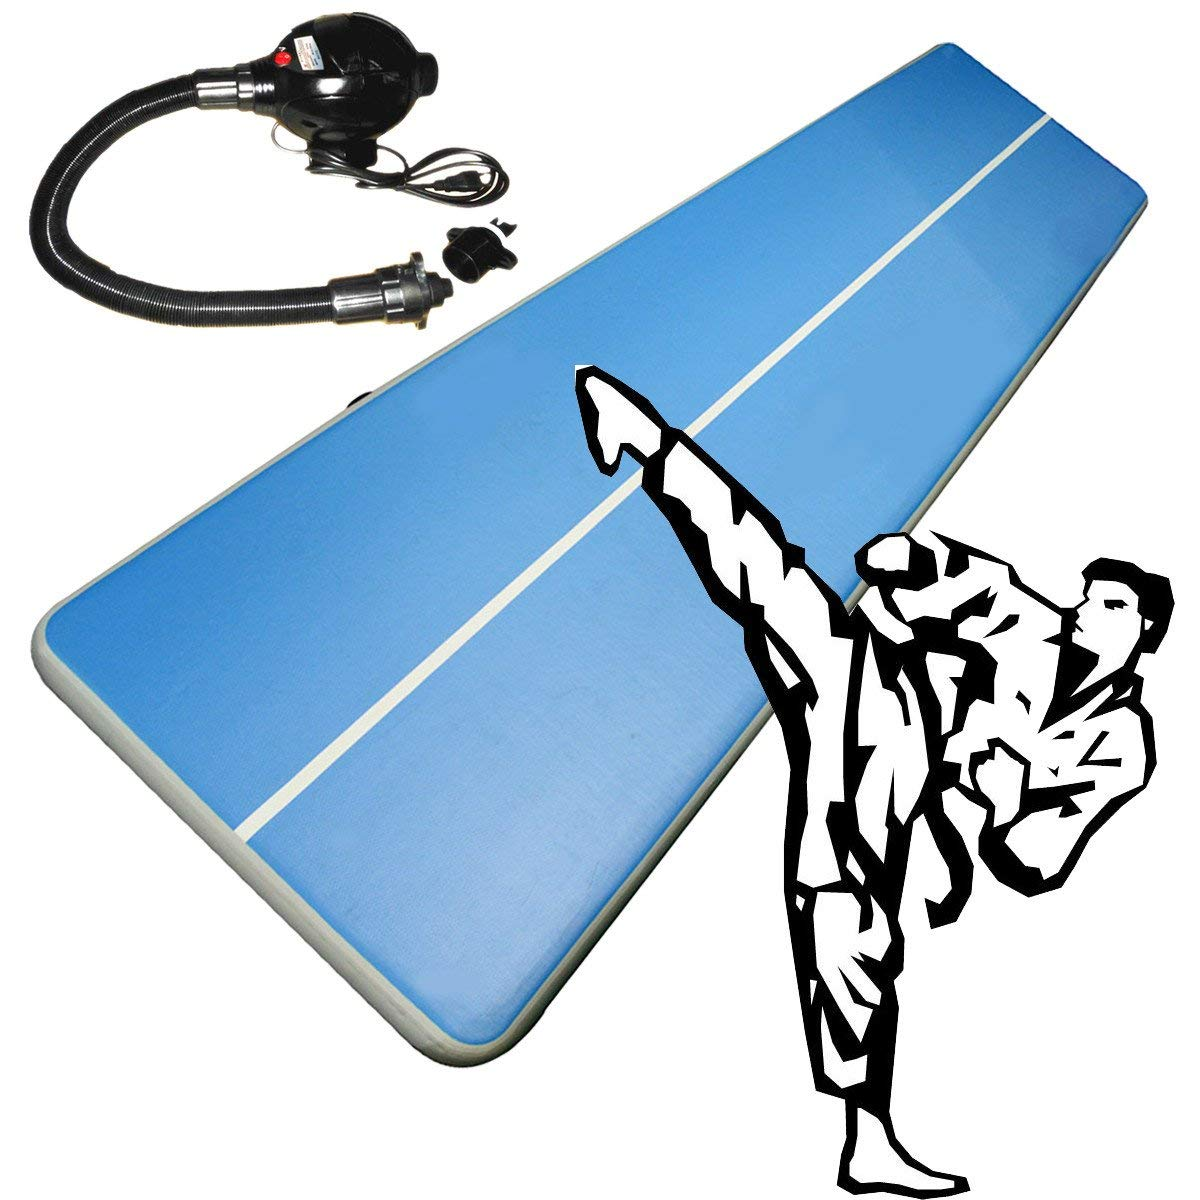 GEOPONICS 157x79x8inchtrack Gymnastics MatGym Track Mat Gym Mat Tumbling Cheerleading Pad